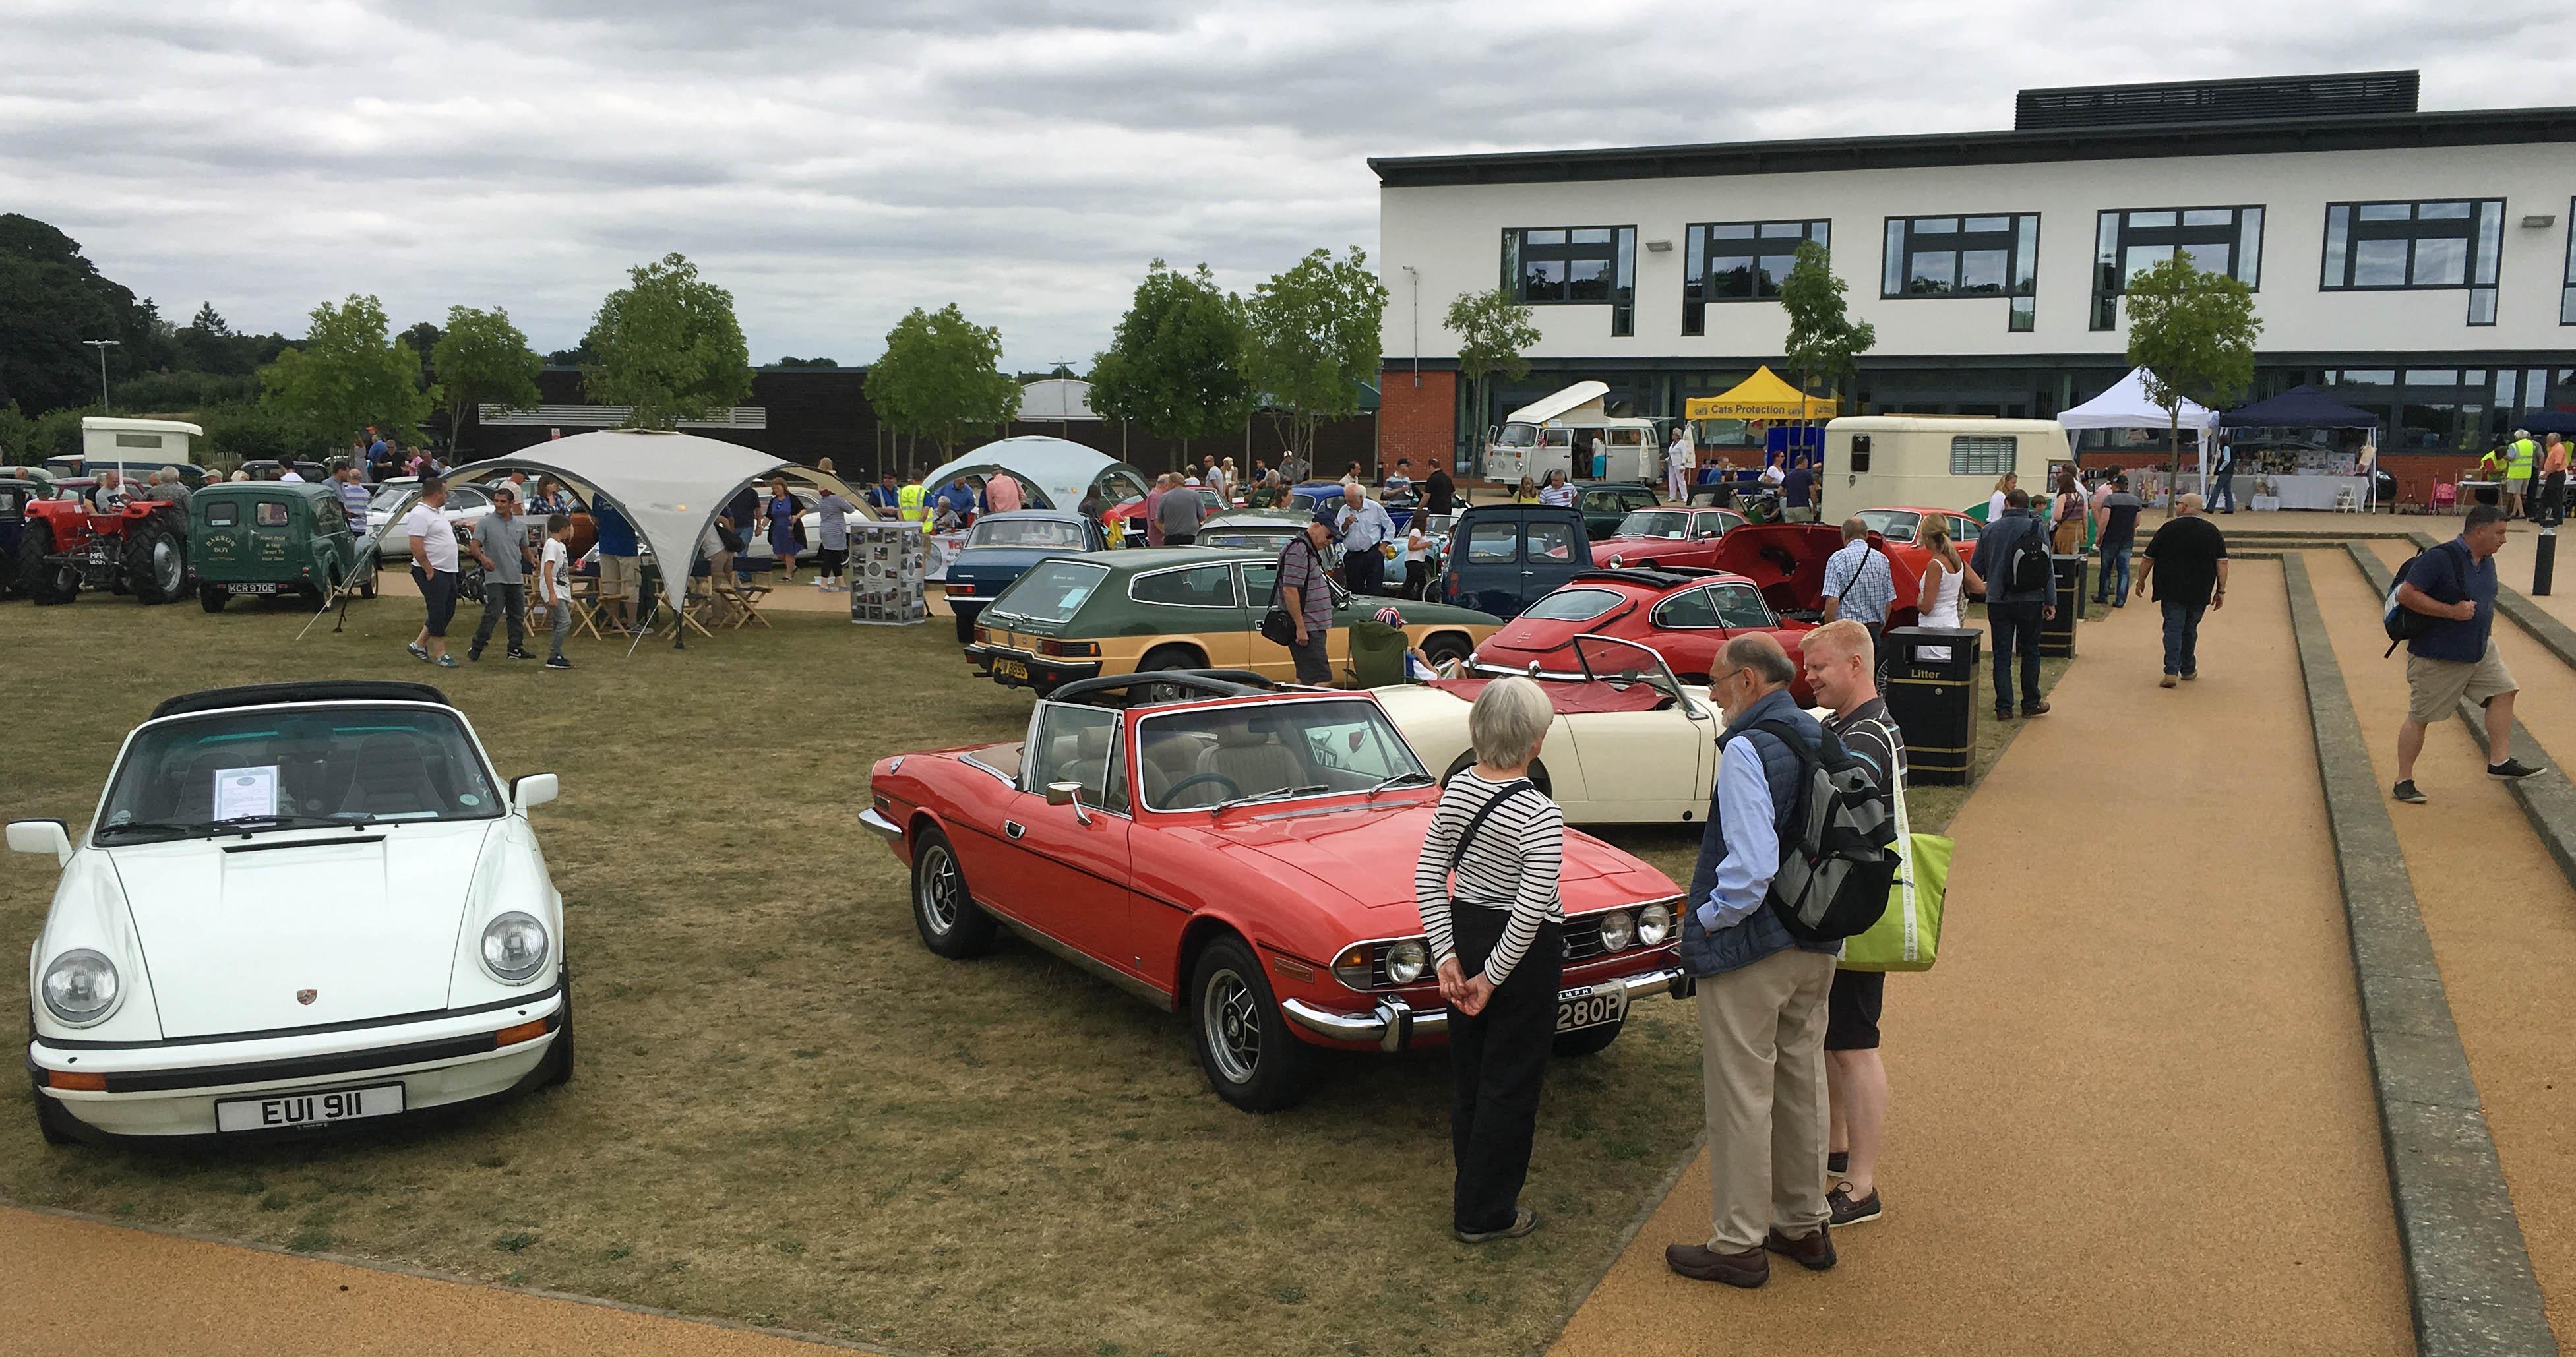 Gallery - West Berkshire Classic Vehicle Club